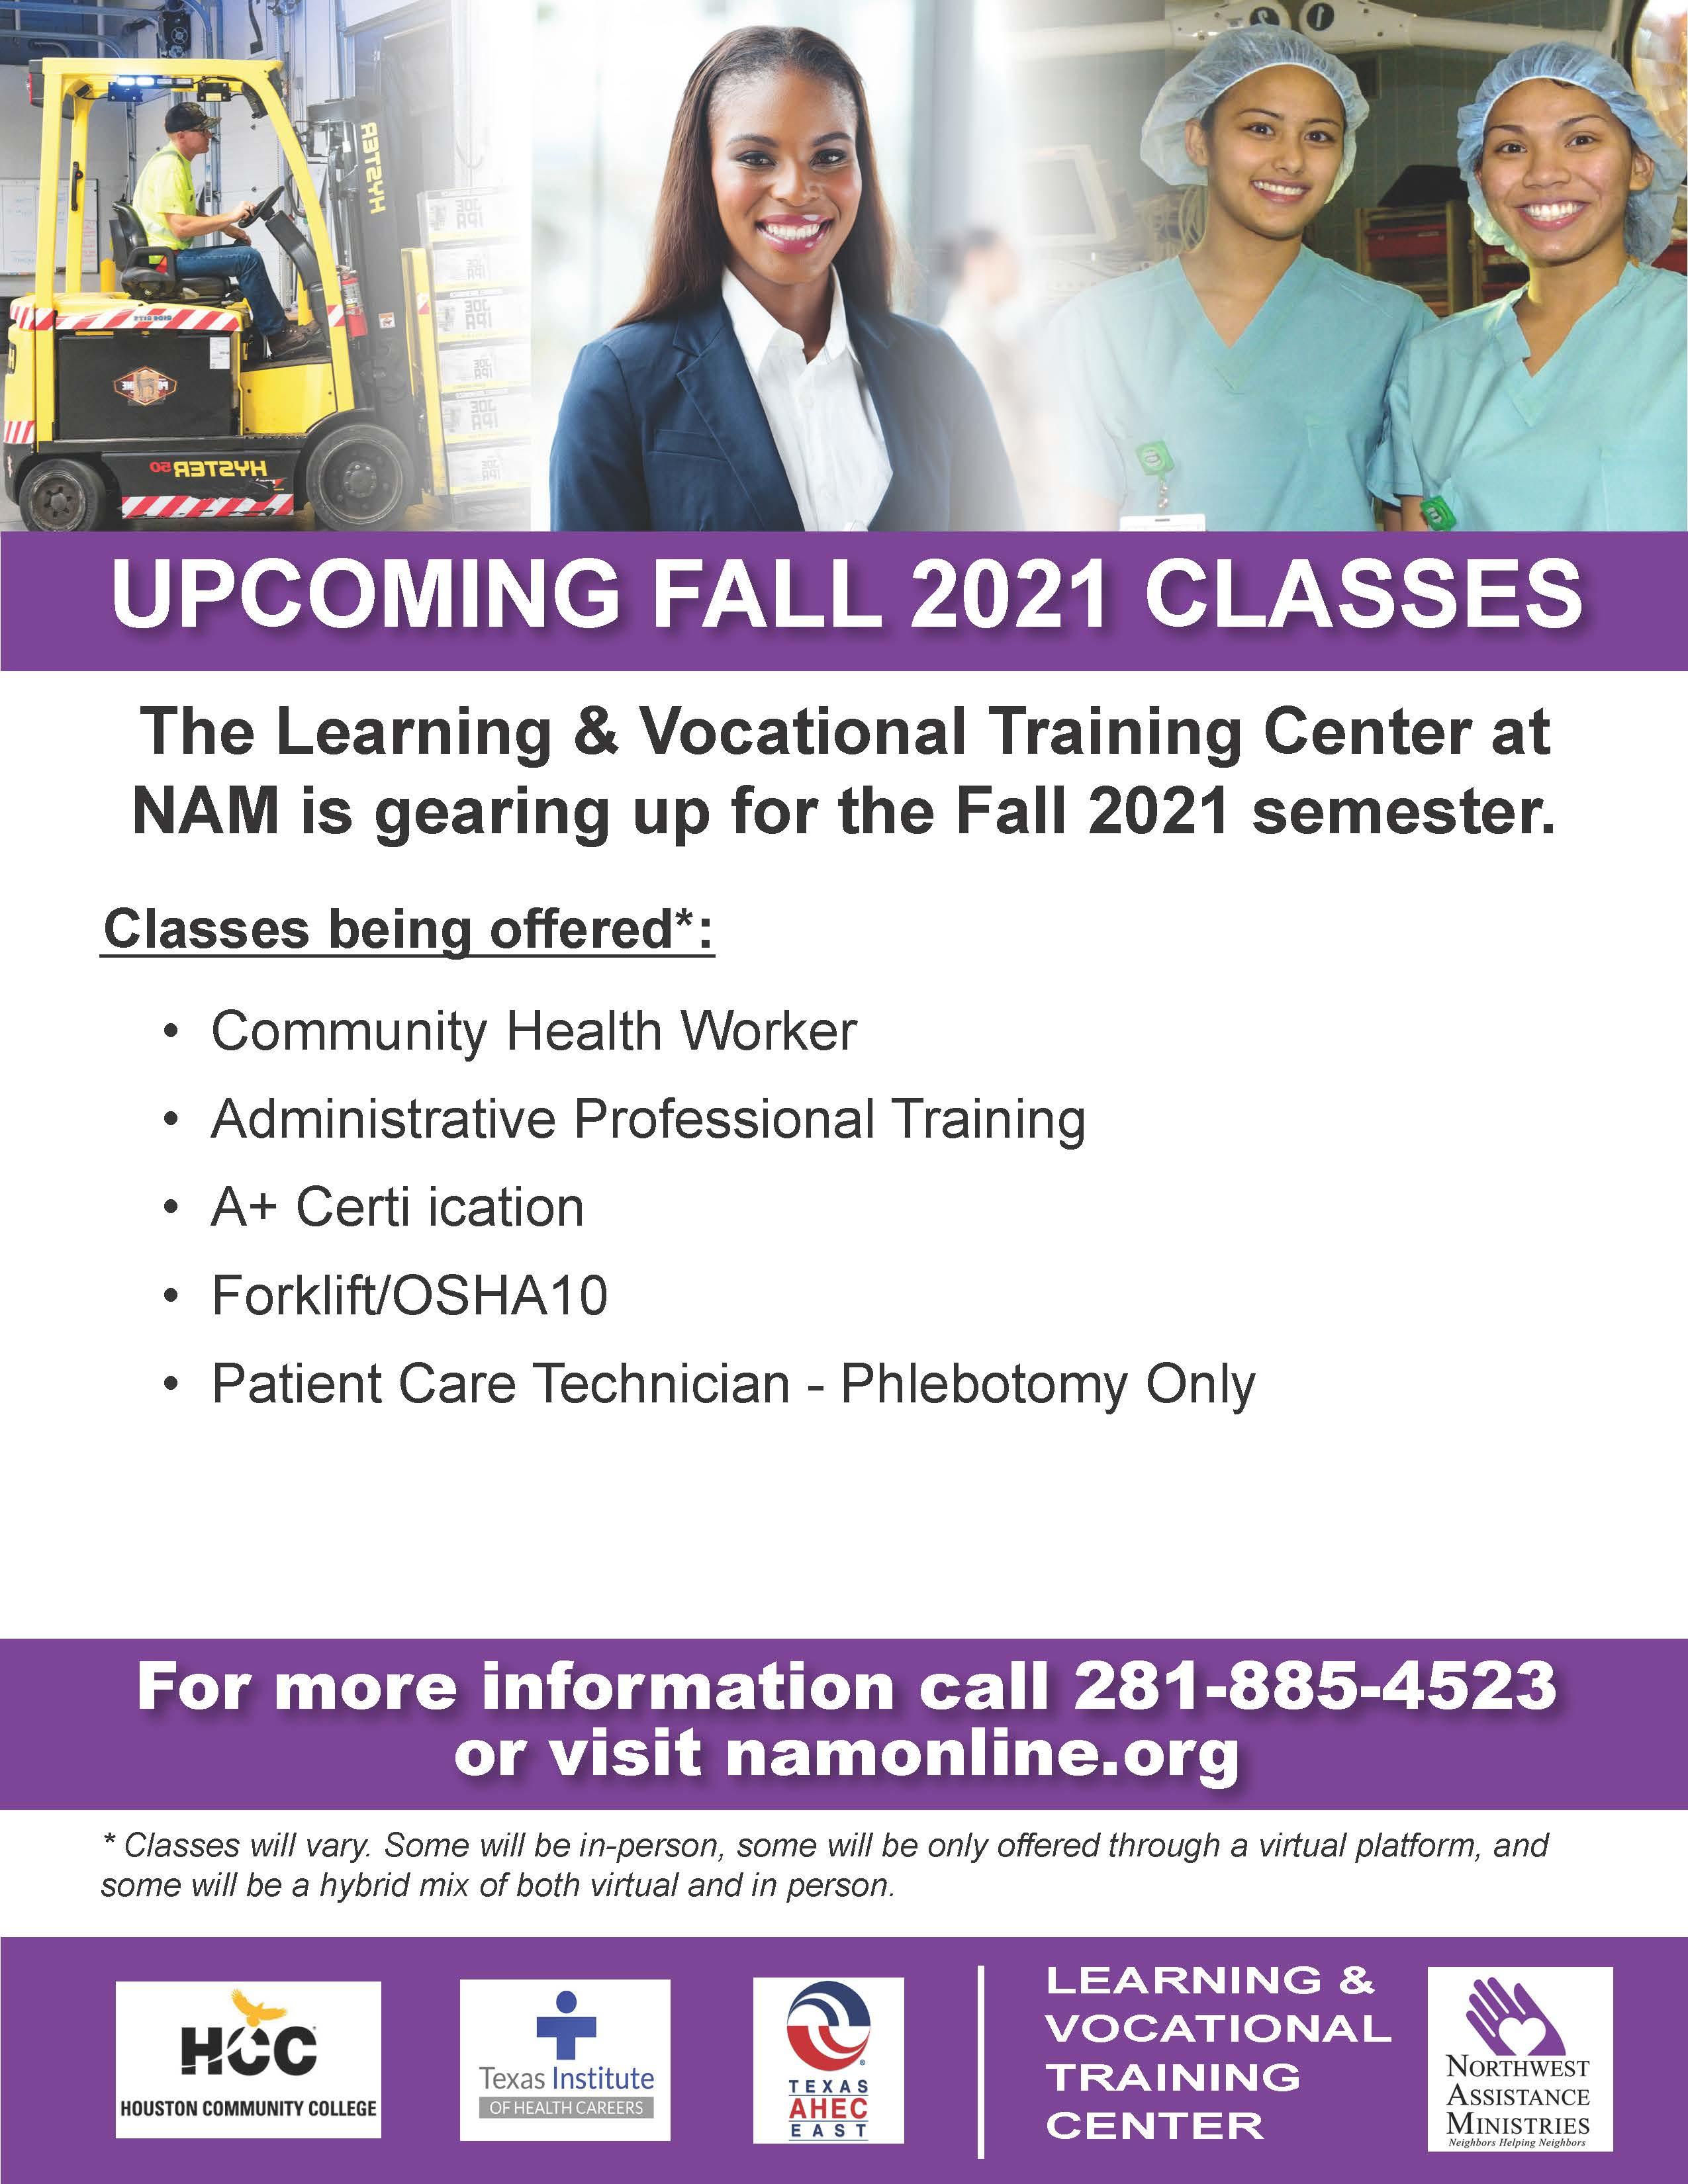 PP-Fall_2021_Classes__-_JULY_UPDATE.jpg